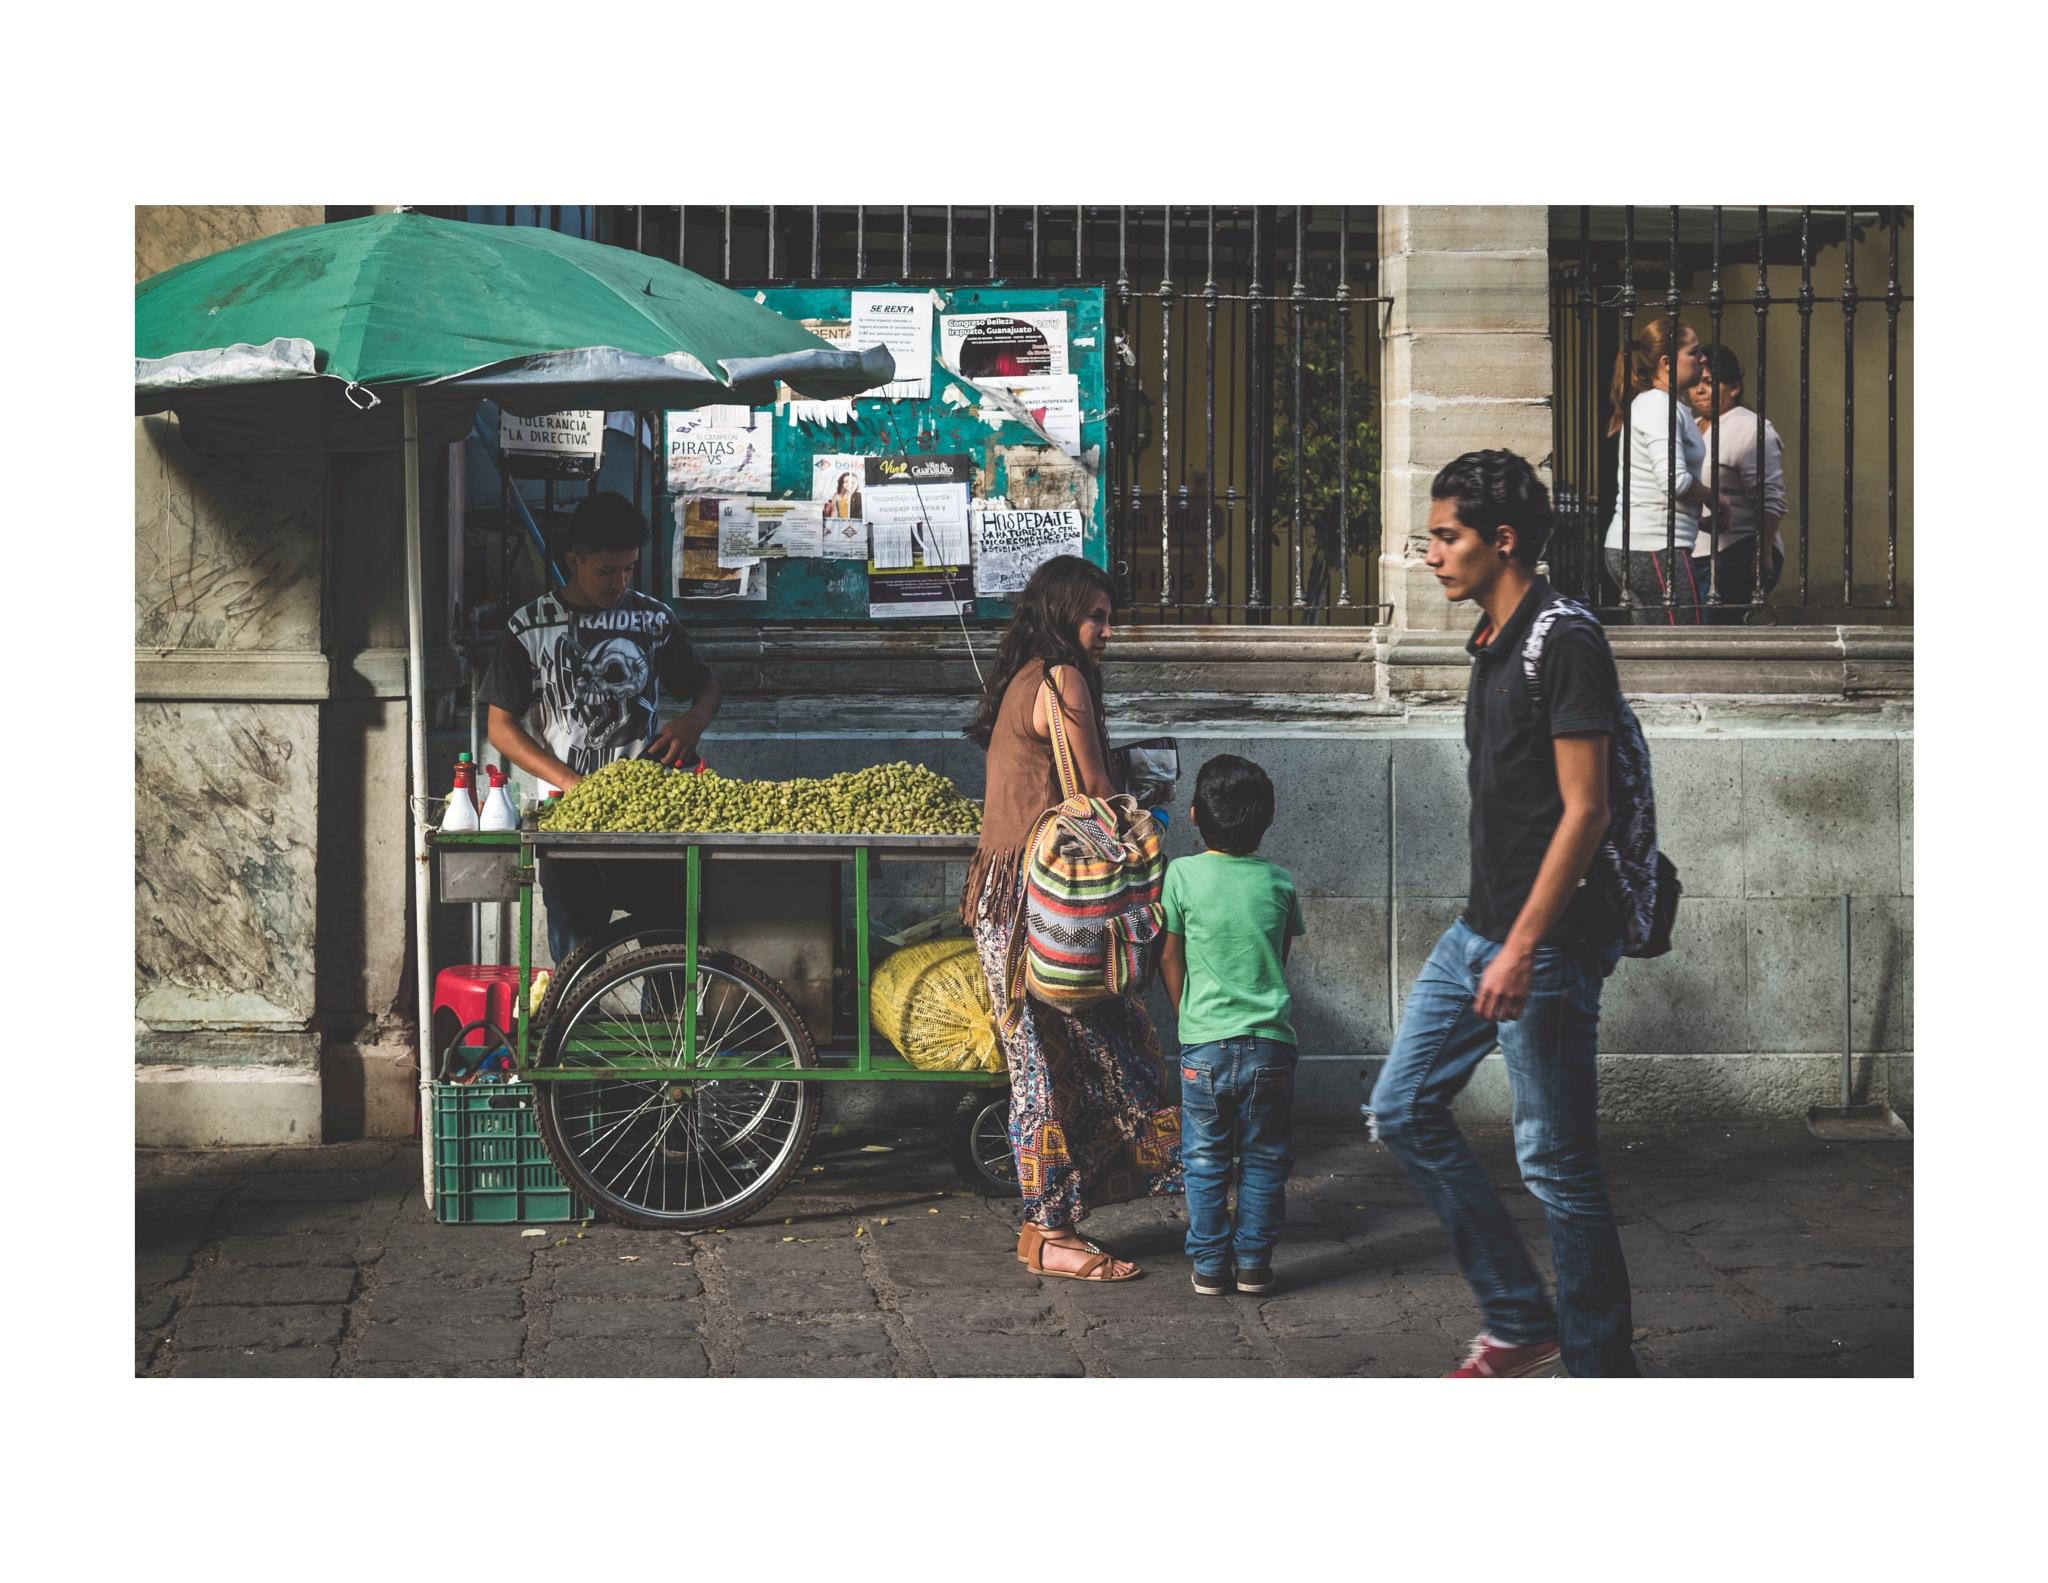 Street Vendor by jhulton